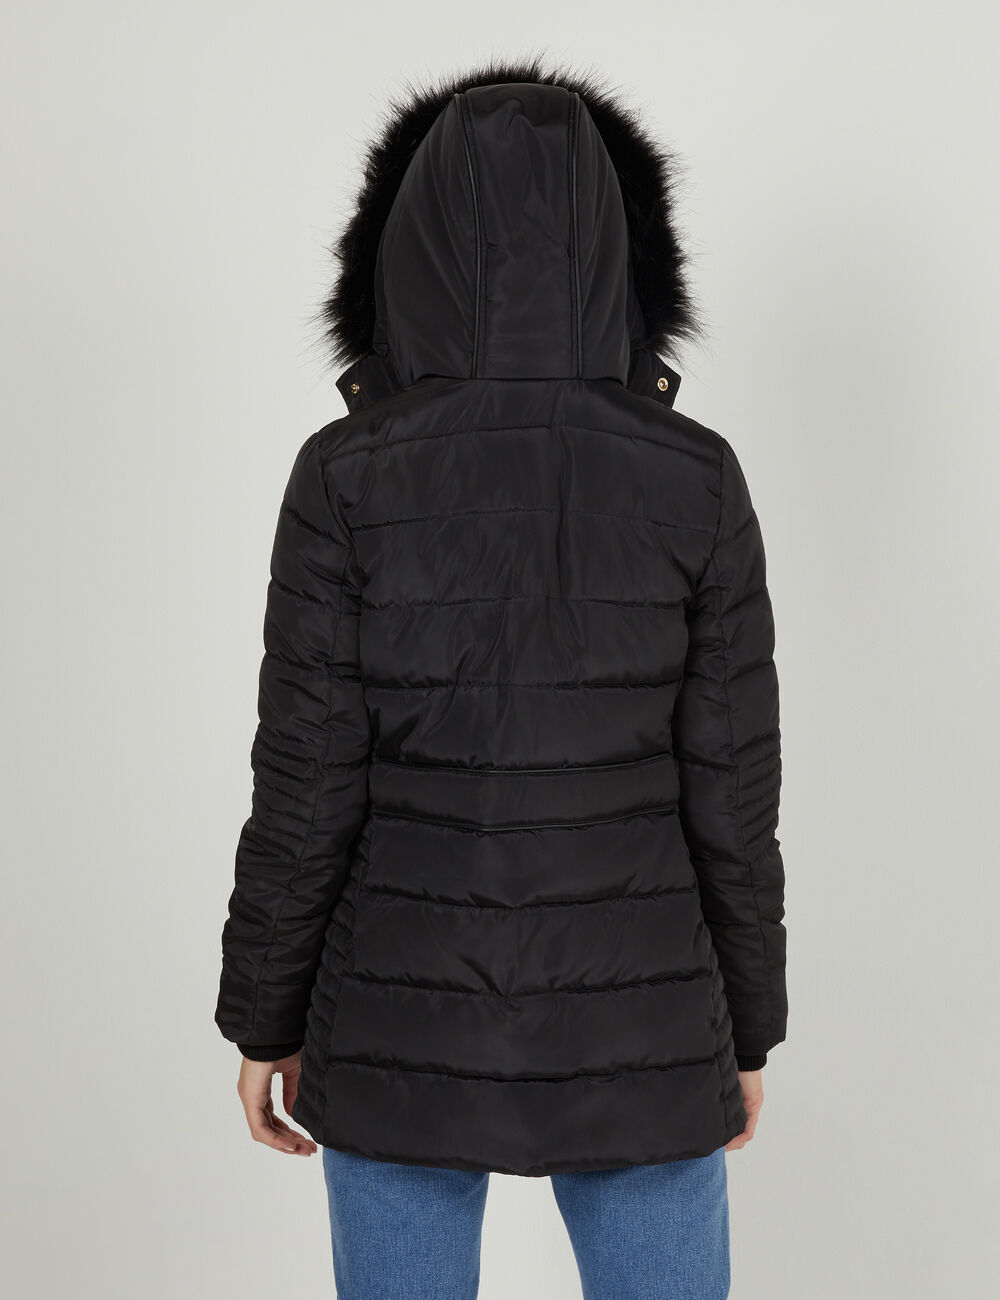 74faaba52e288 Doudoune longue noire femme • Jennyfer